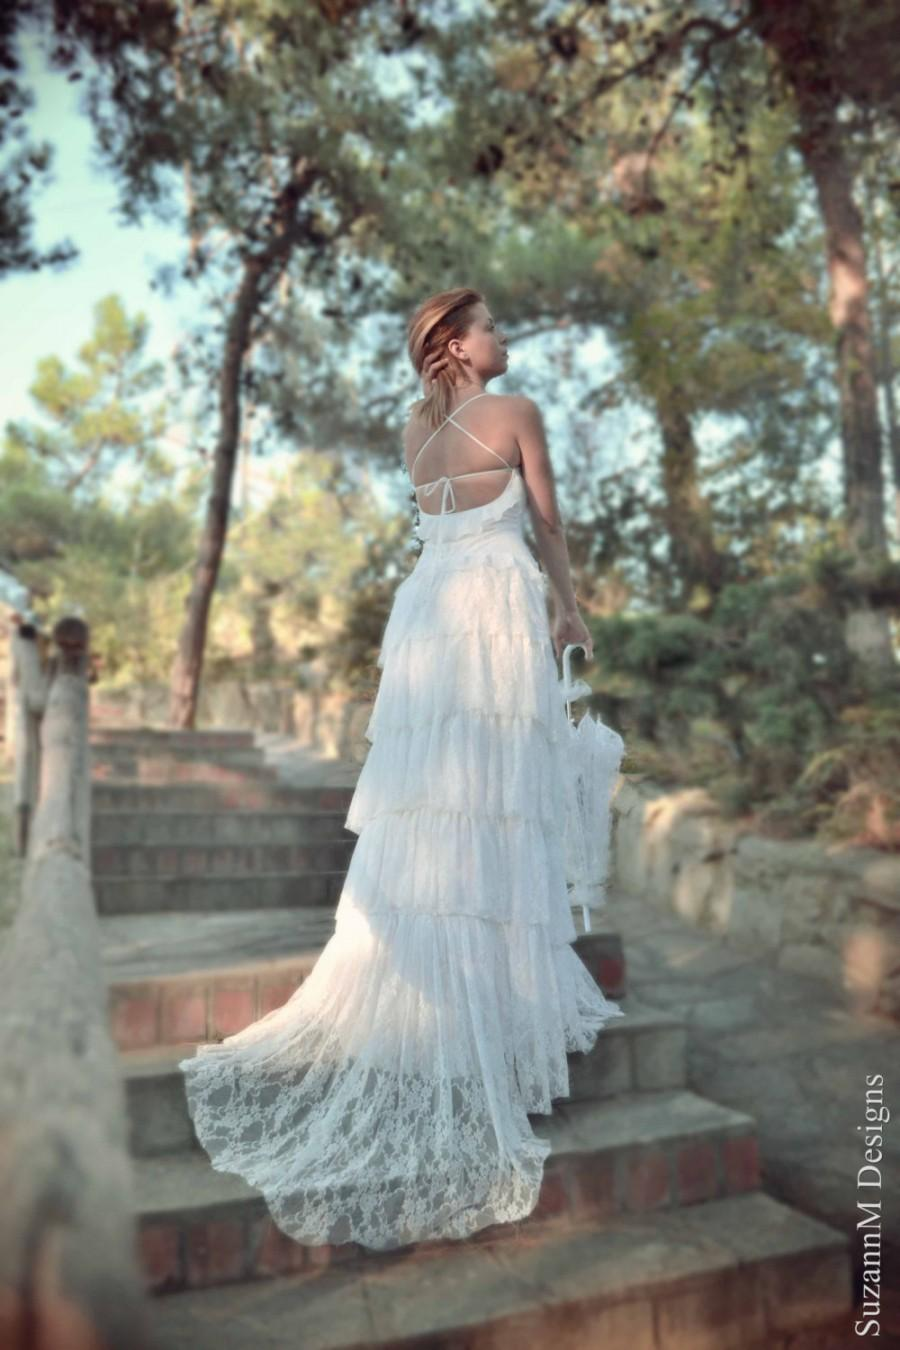 زفاف - White Wedding Dress, Lace Wedding Dress, Bohemian Wedding Dress, Boho Wedding Dress, White Bridal Dress, Long Wedding Gown, SuzannaM Designs